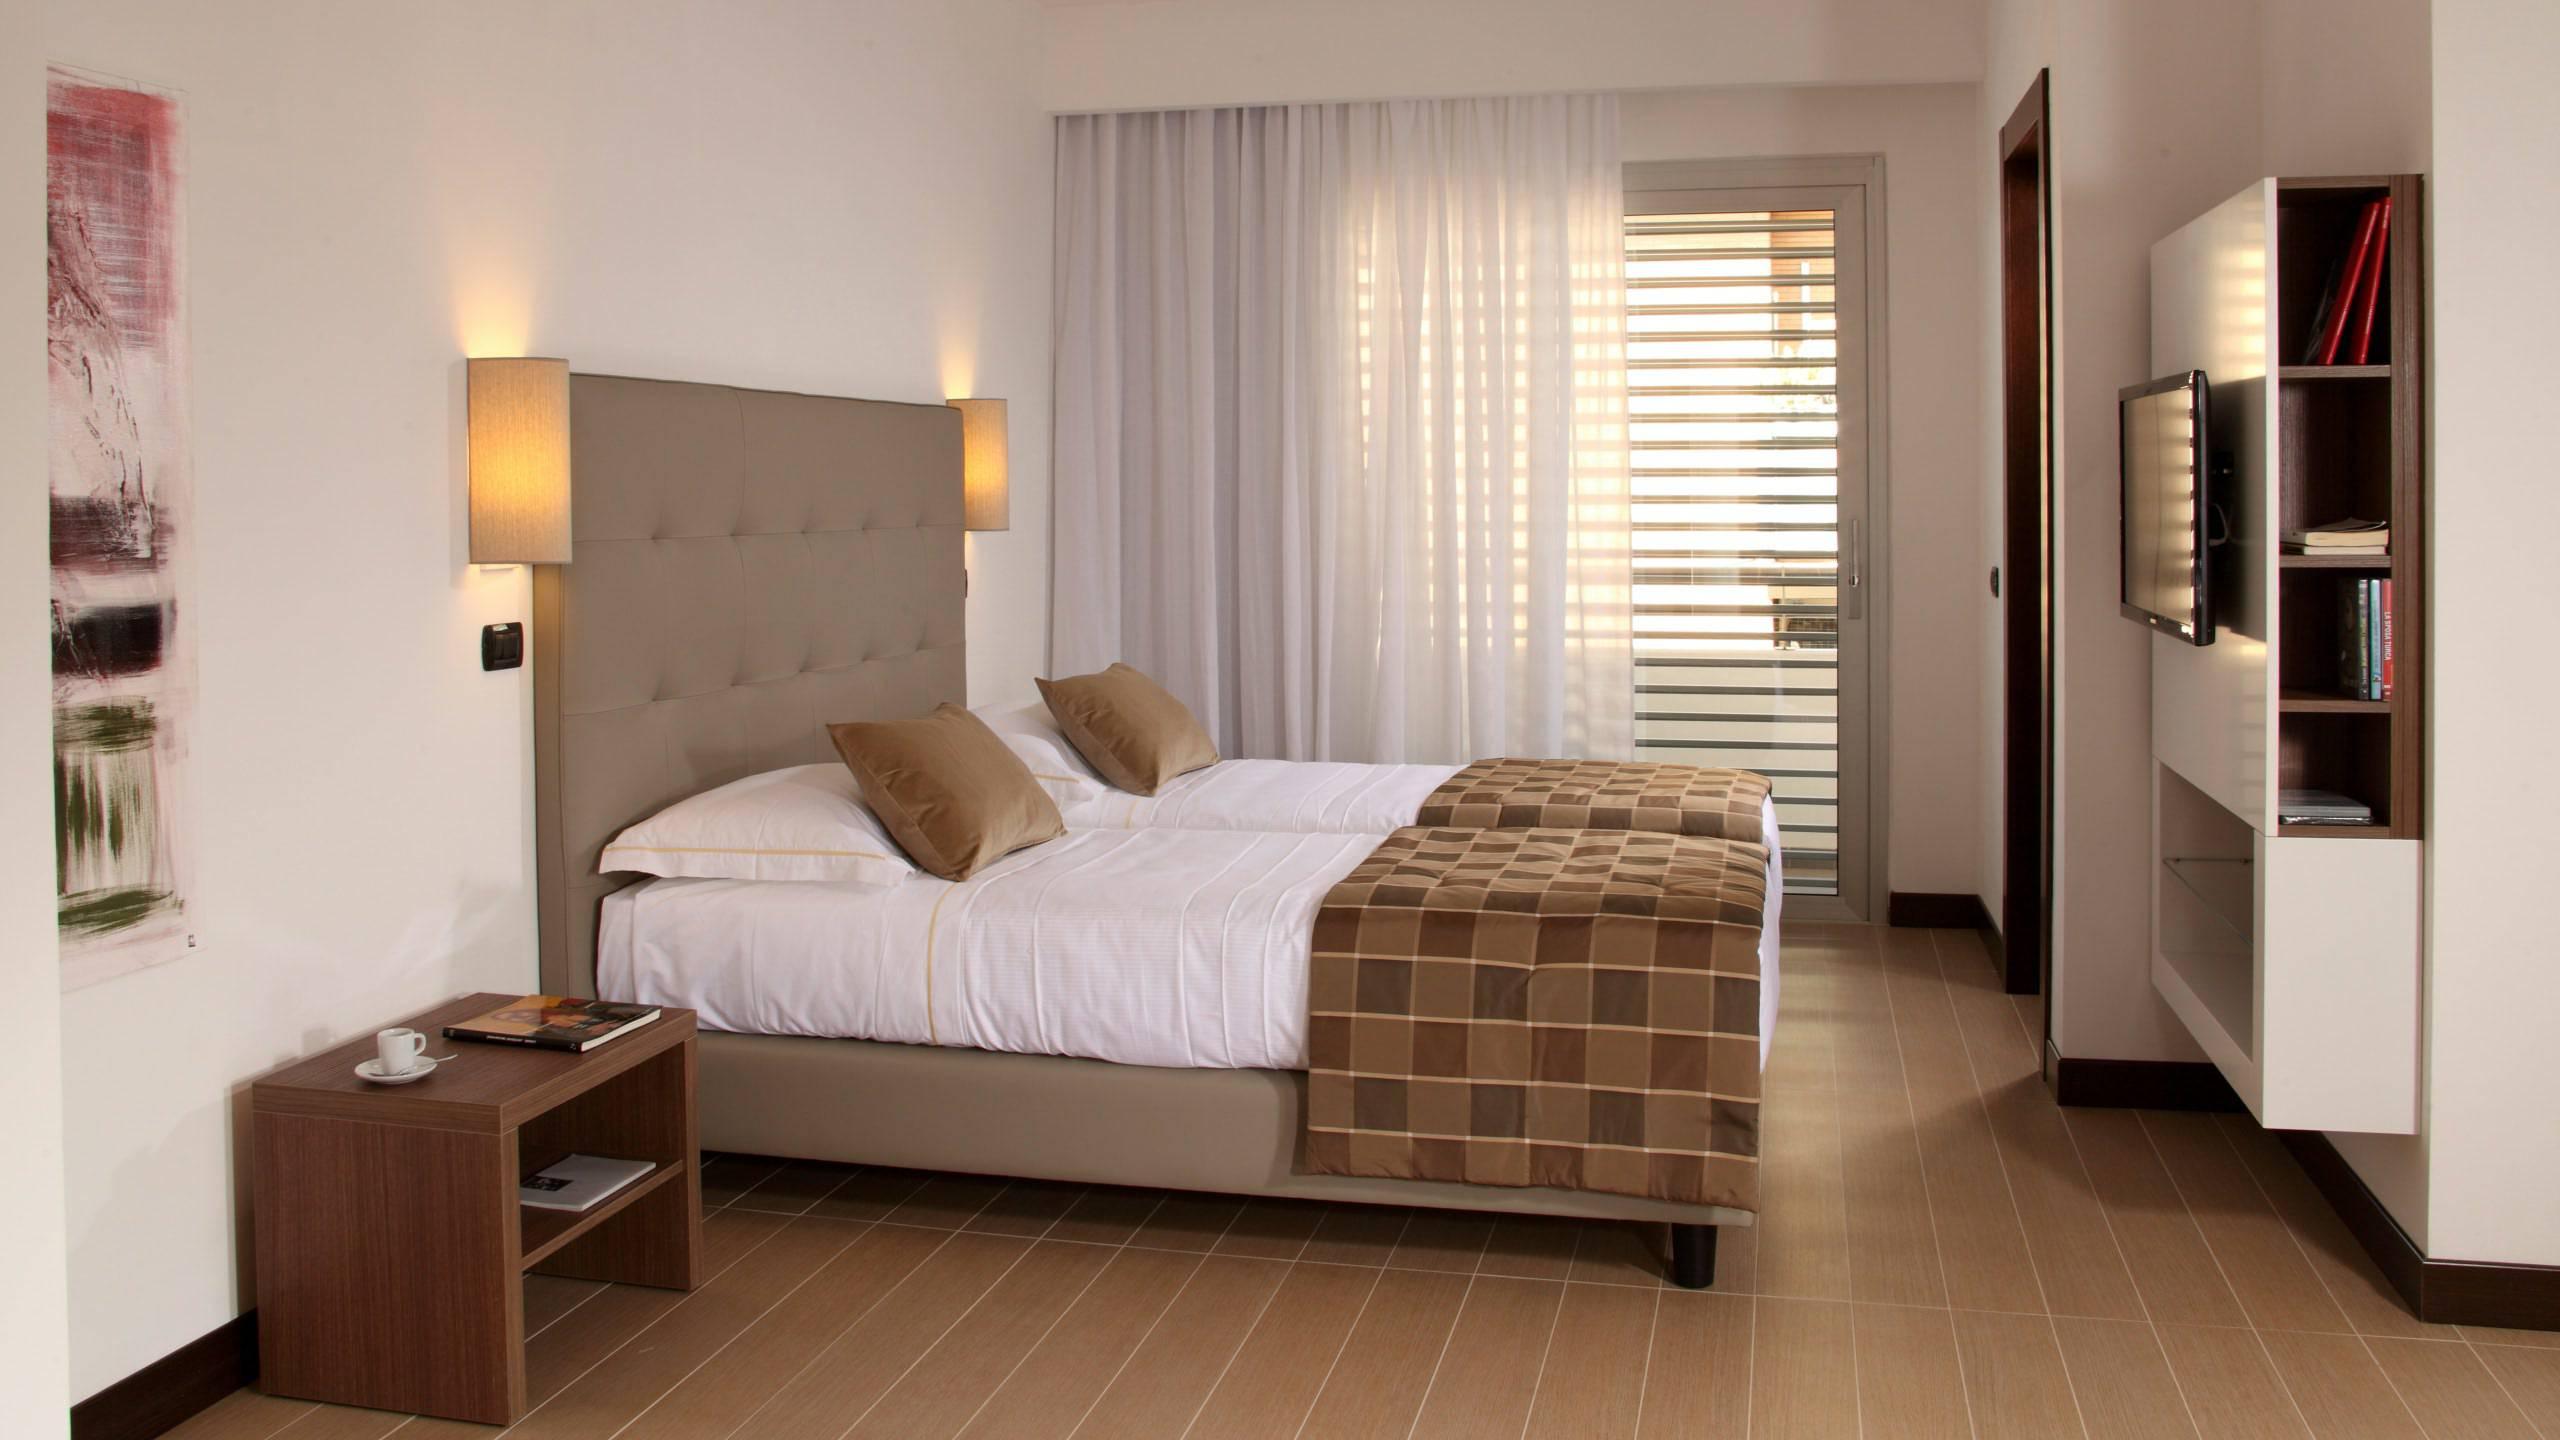 Residence Hotel Parioli Roma Sito Ufficiale